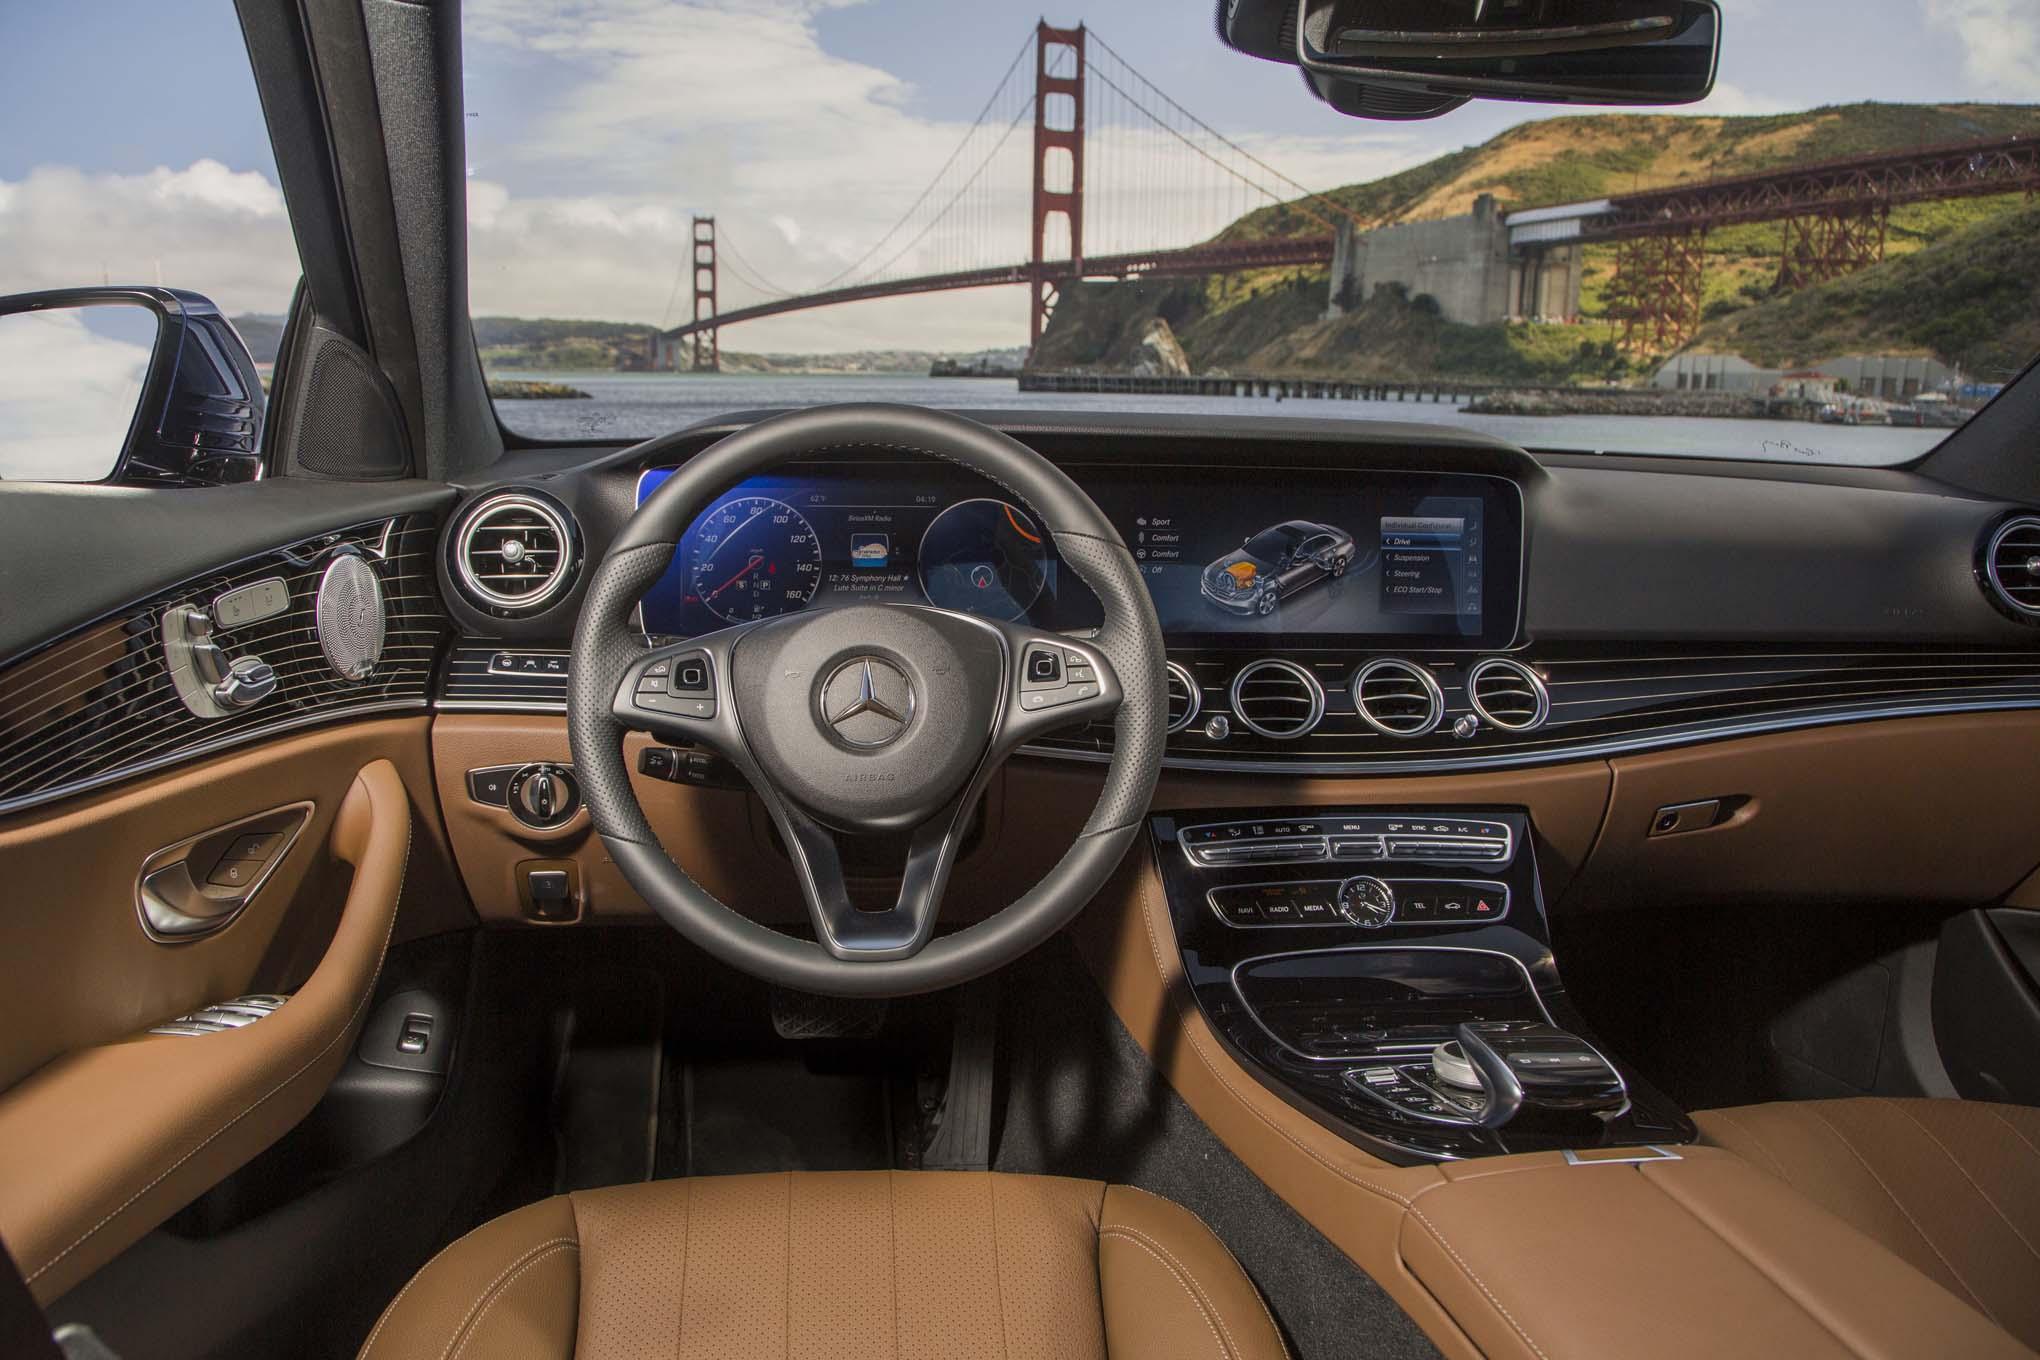 6 New Tech Features On The 2017 Mercedes Benz E Class